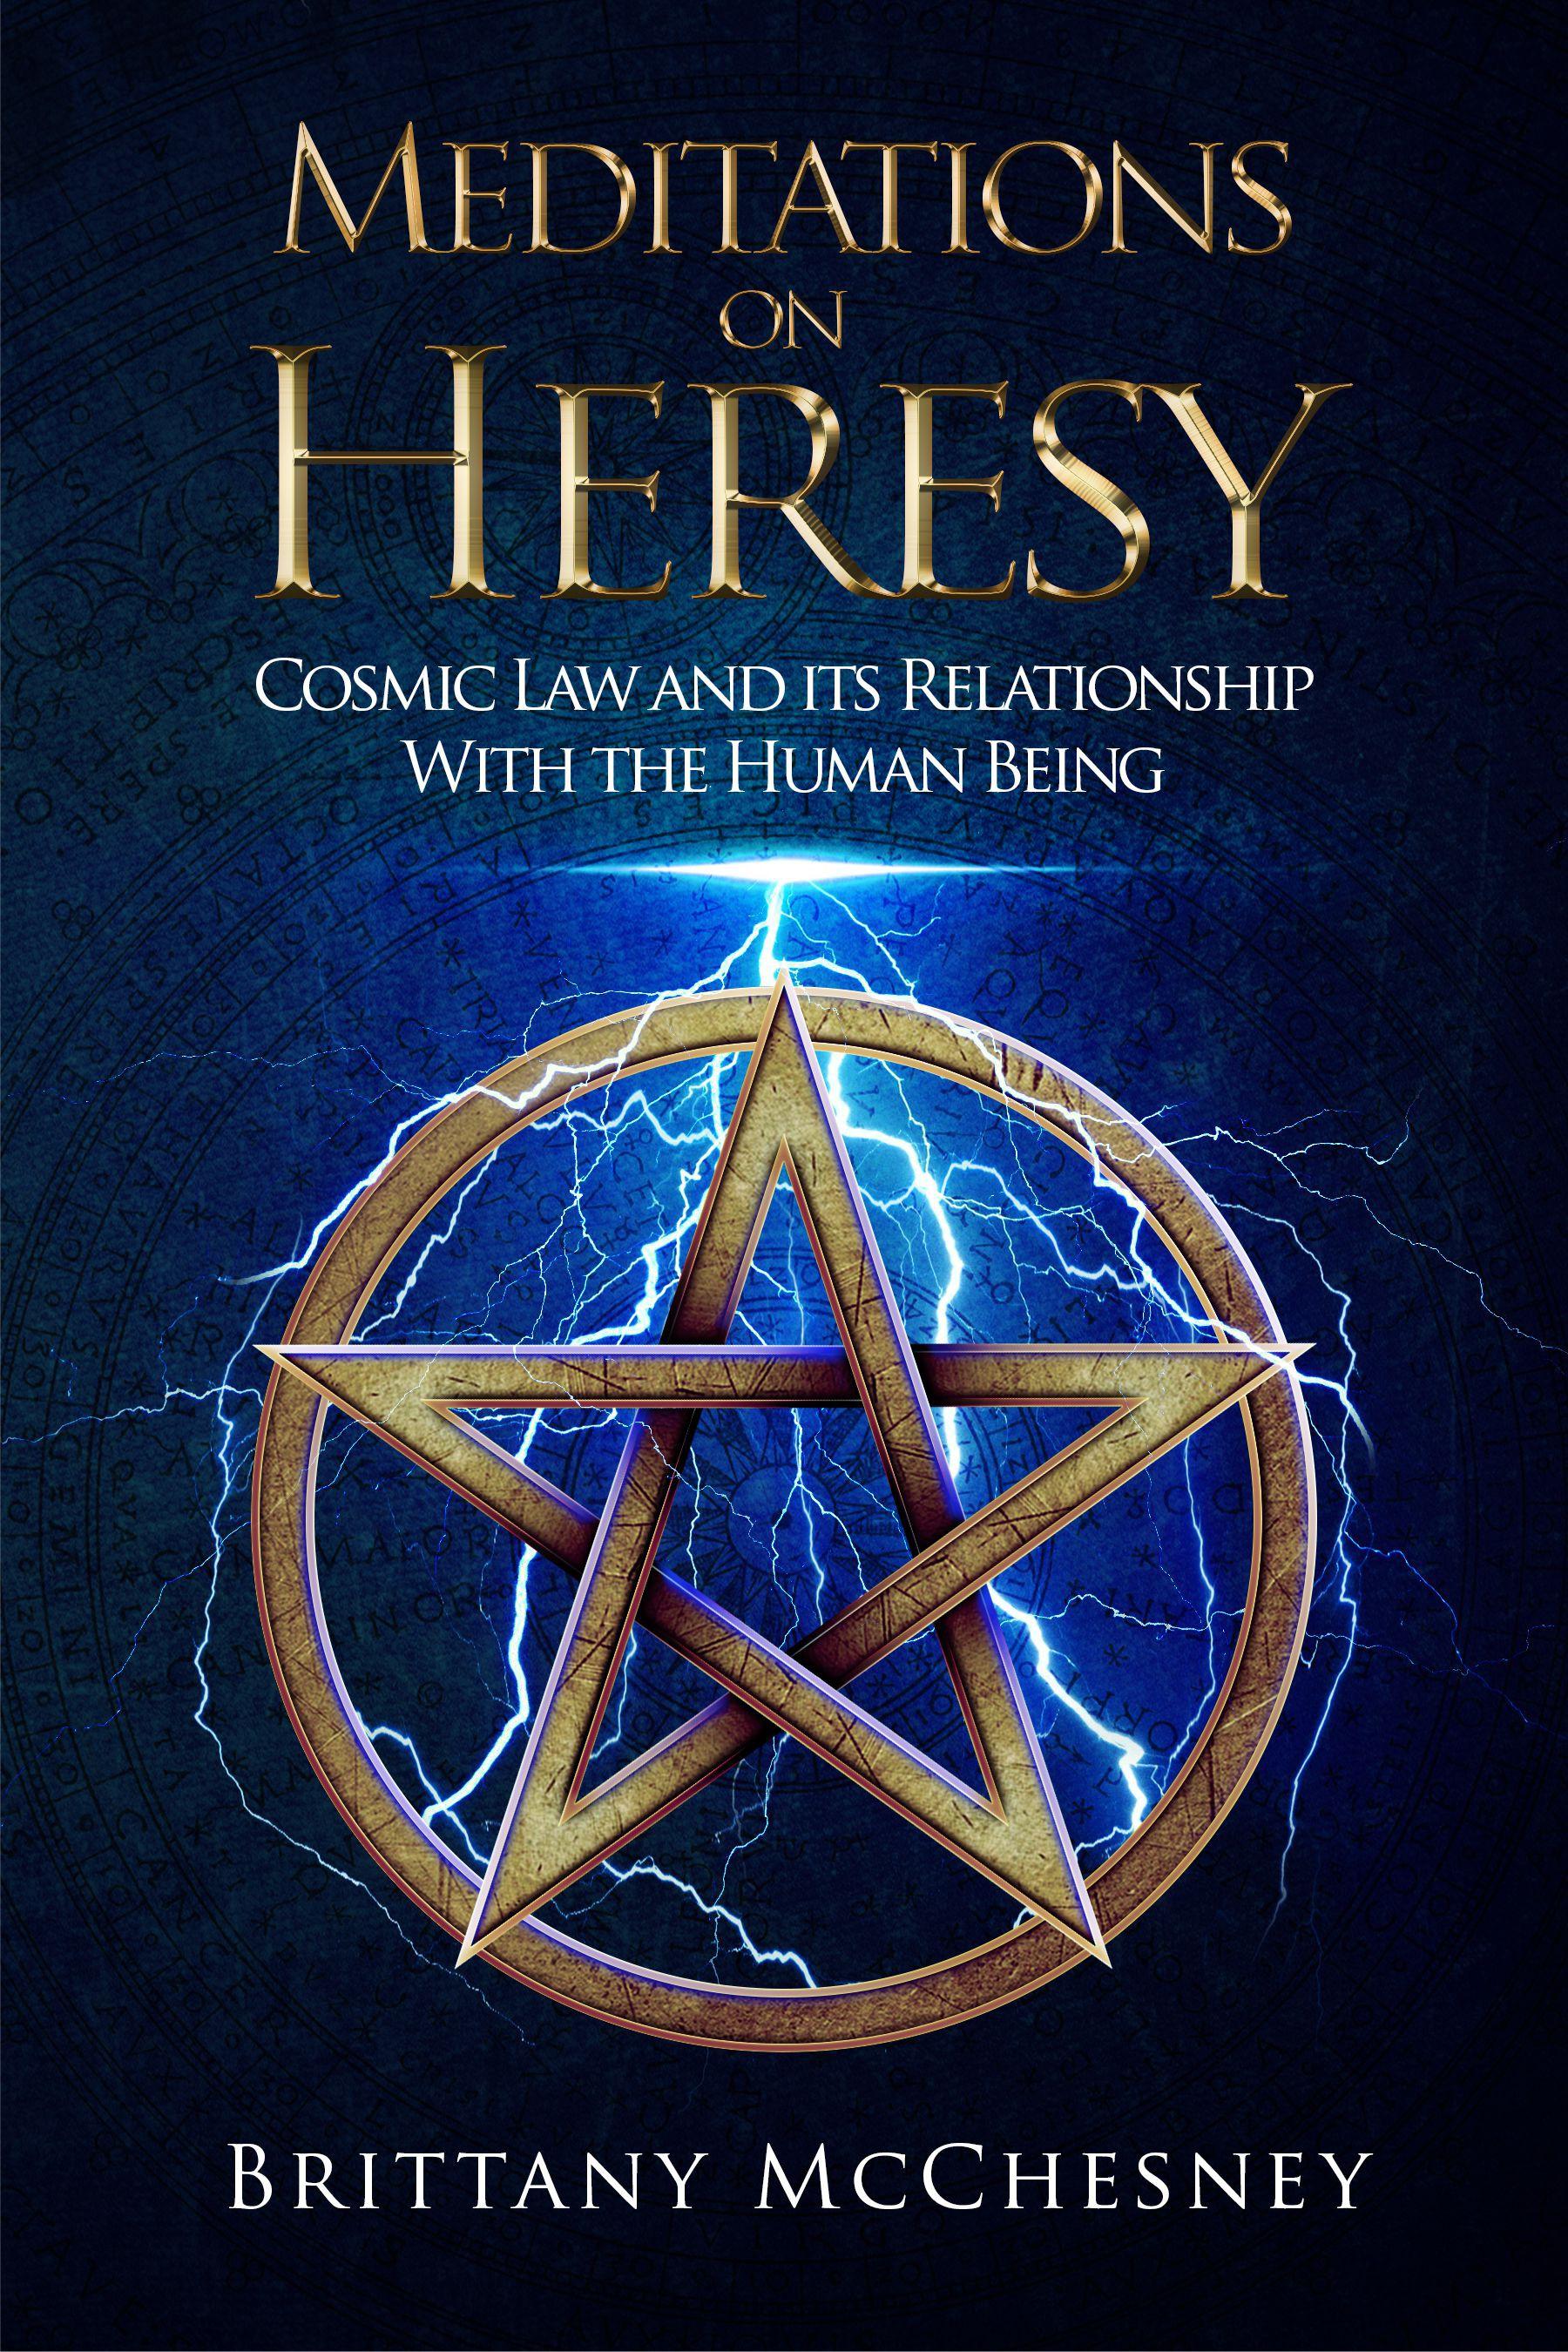 Meditations on Heresy